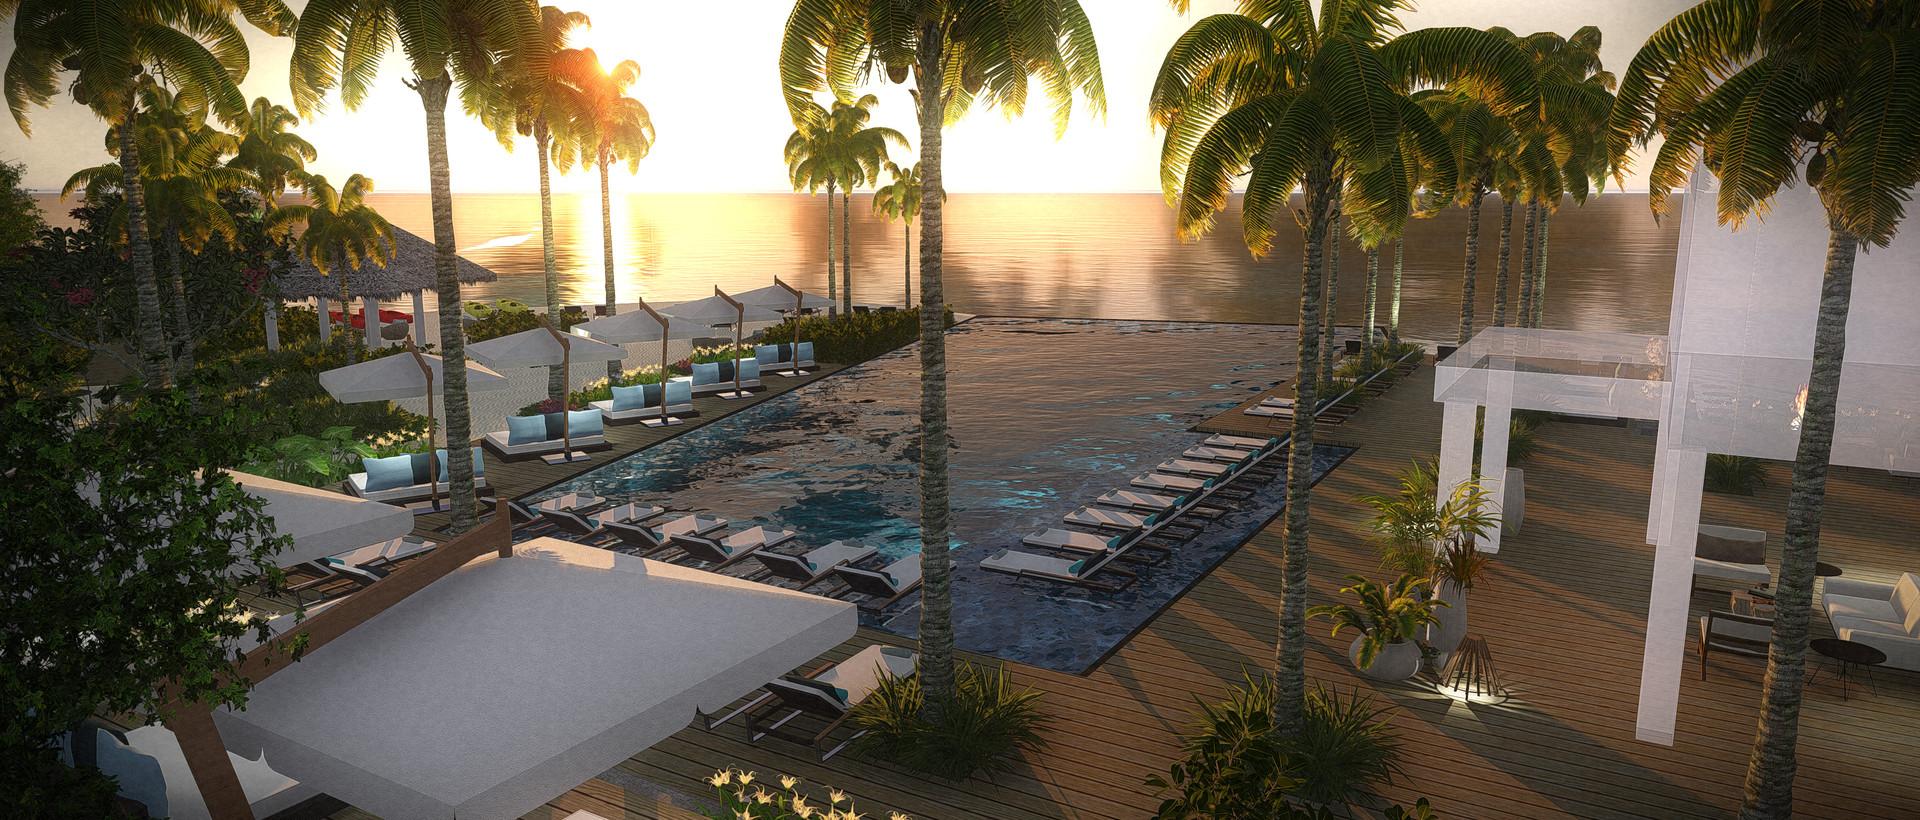 Avani Maldives Topo Design Studio (1).jp